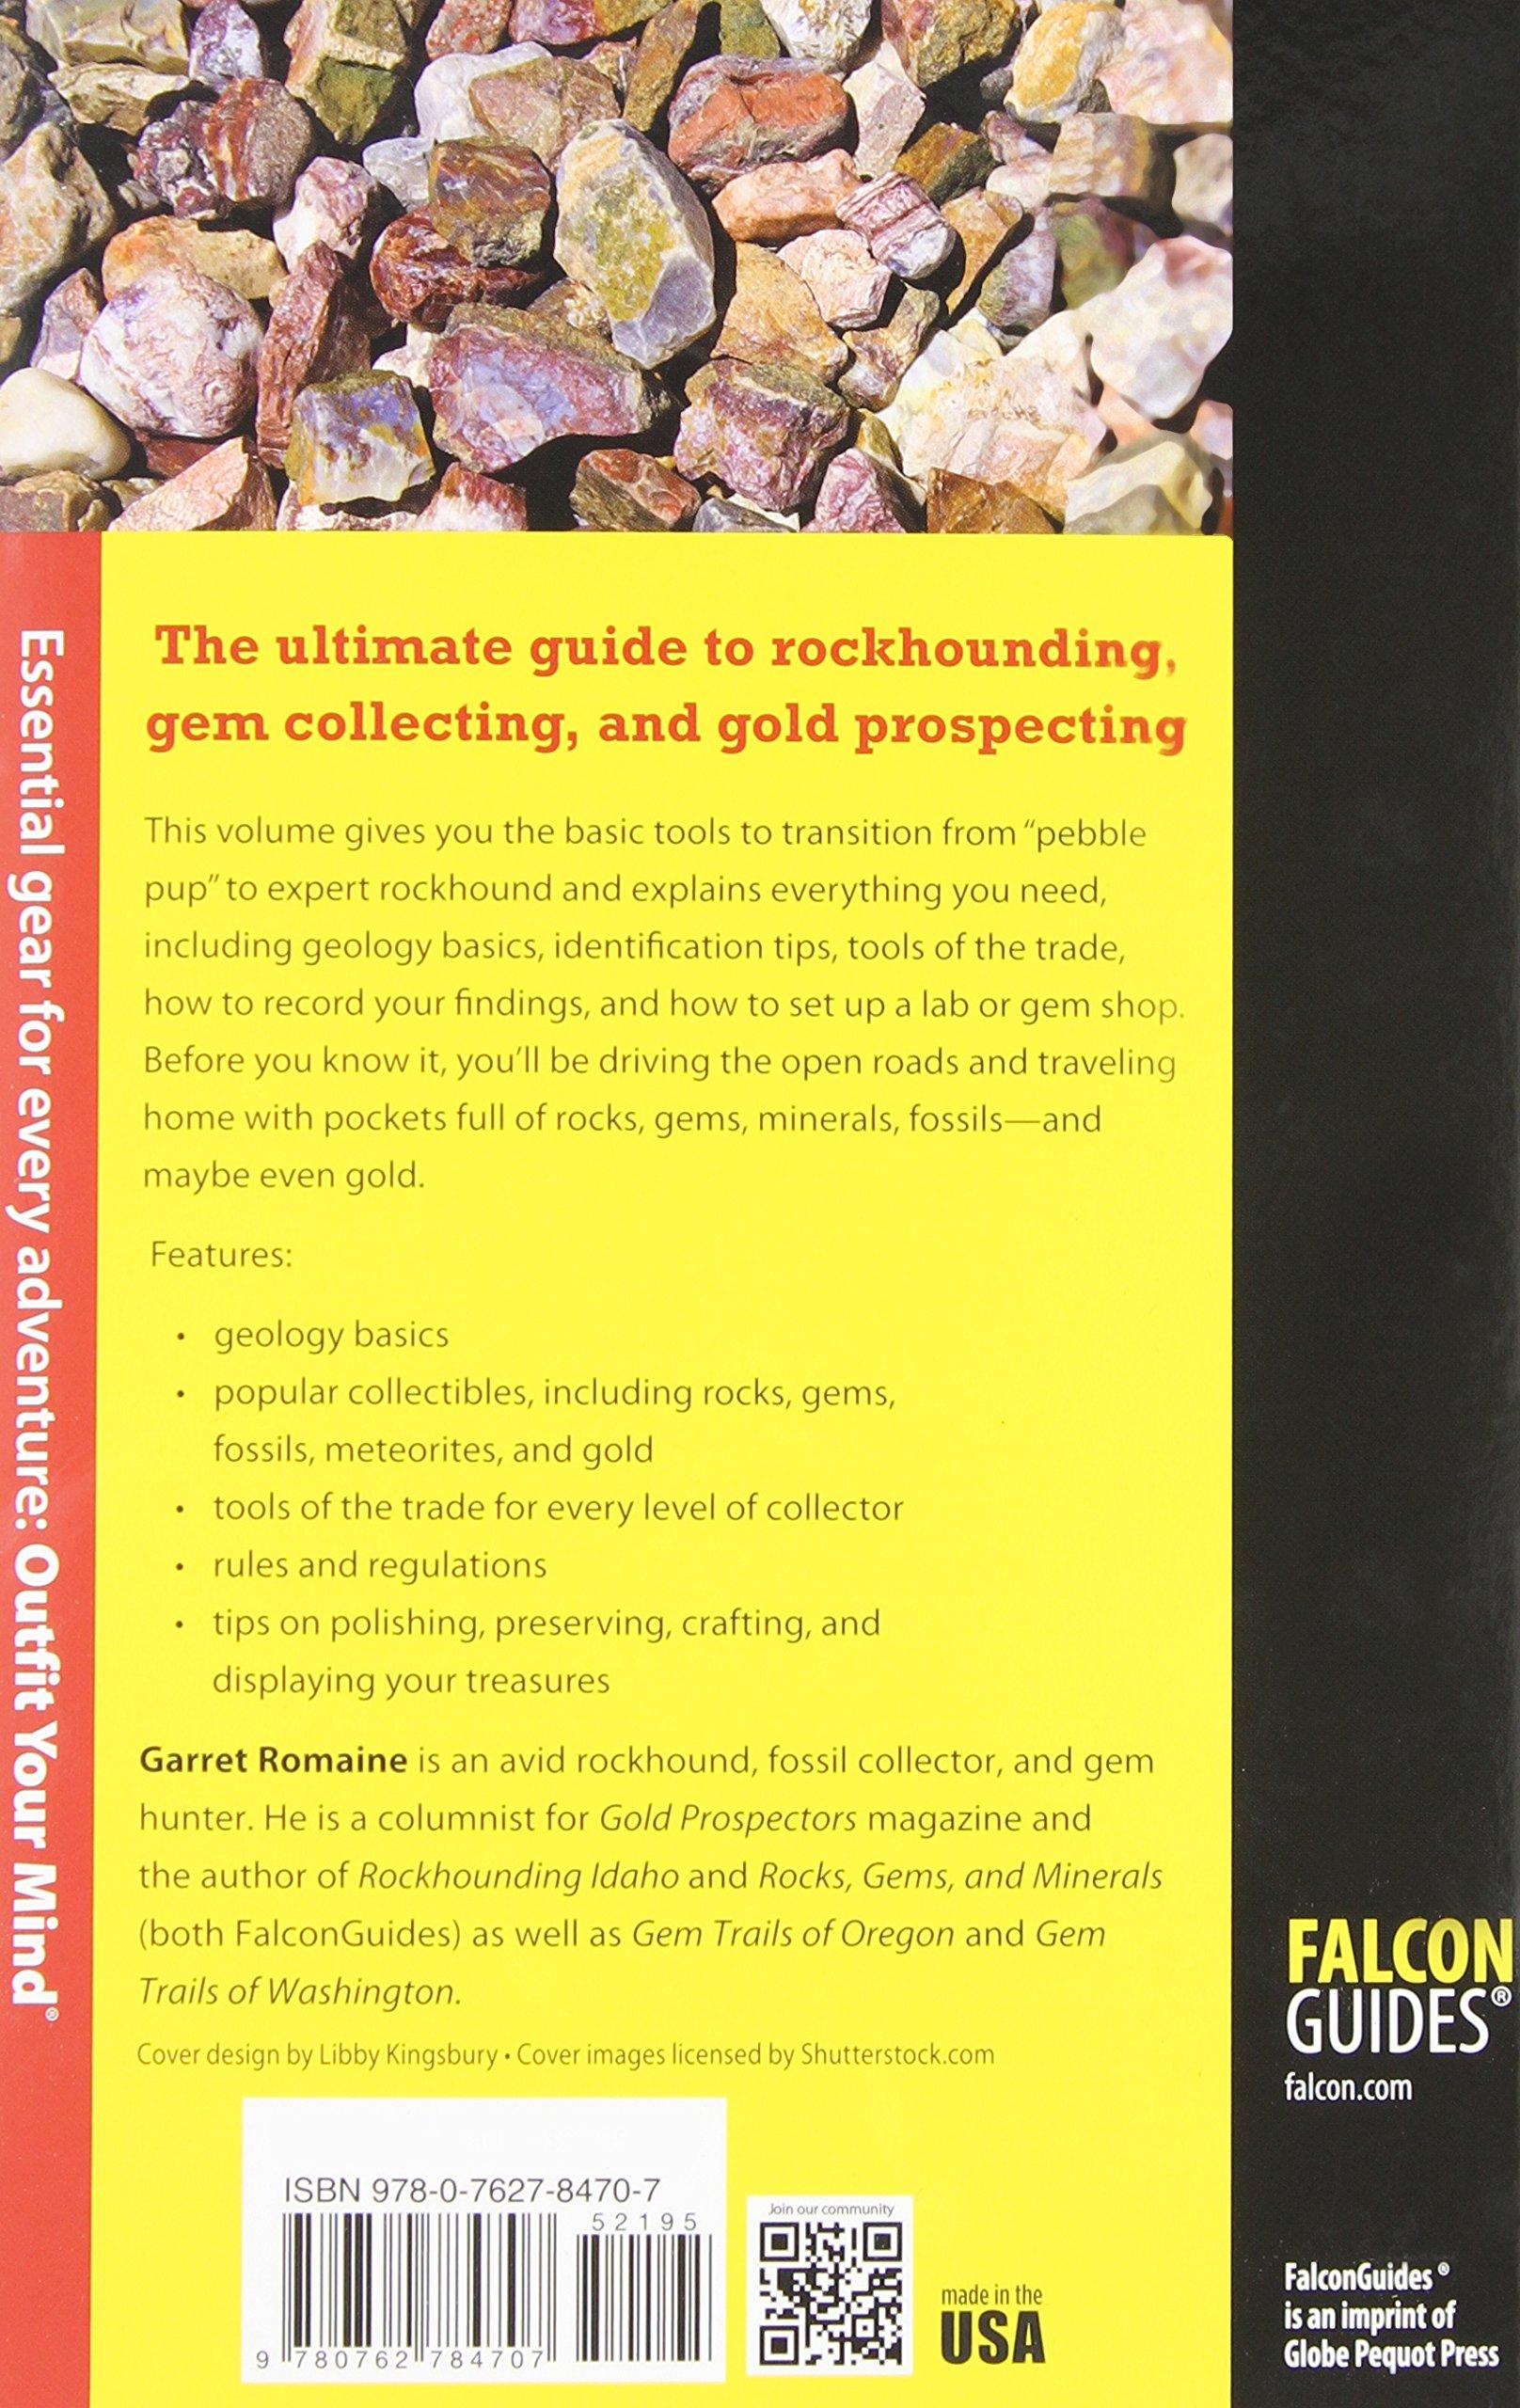 The Modern Rockhounding and Prospecting Handbook (Falcon